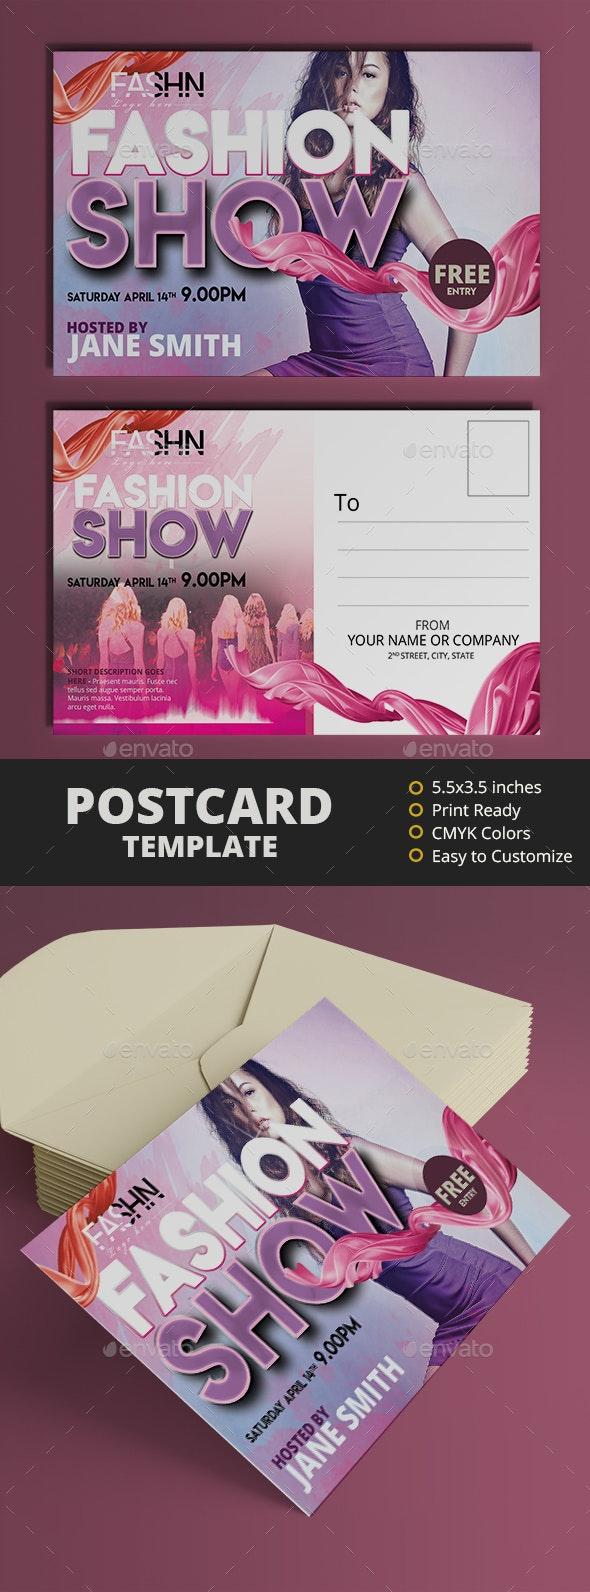 Fashion Show Postcard - Cards & Invites Print Templates